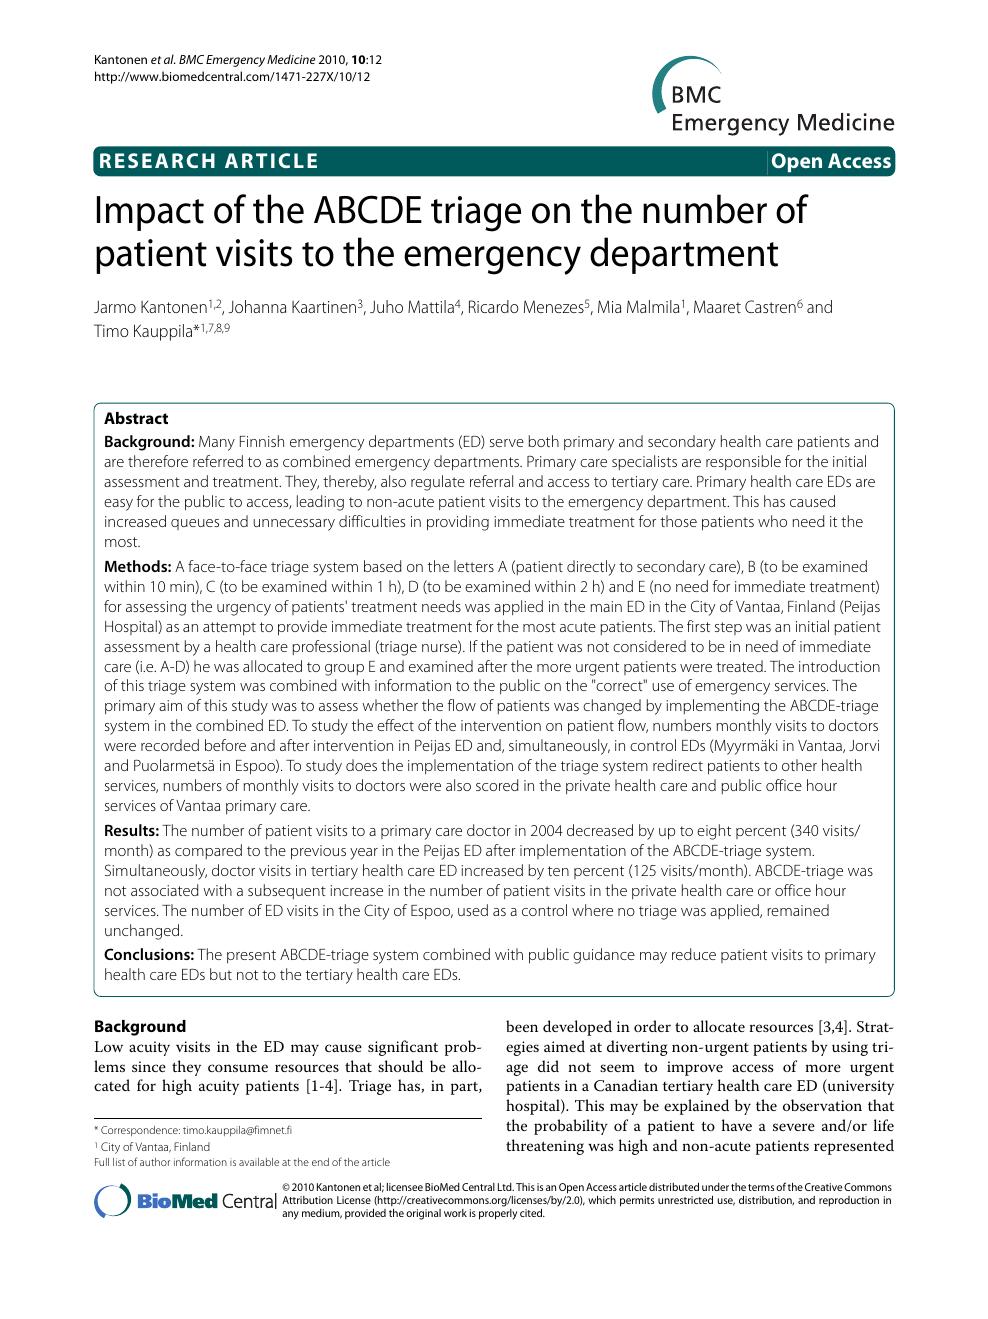 ABC de la diabetes pdf download